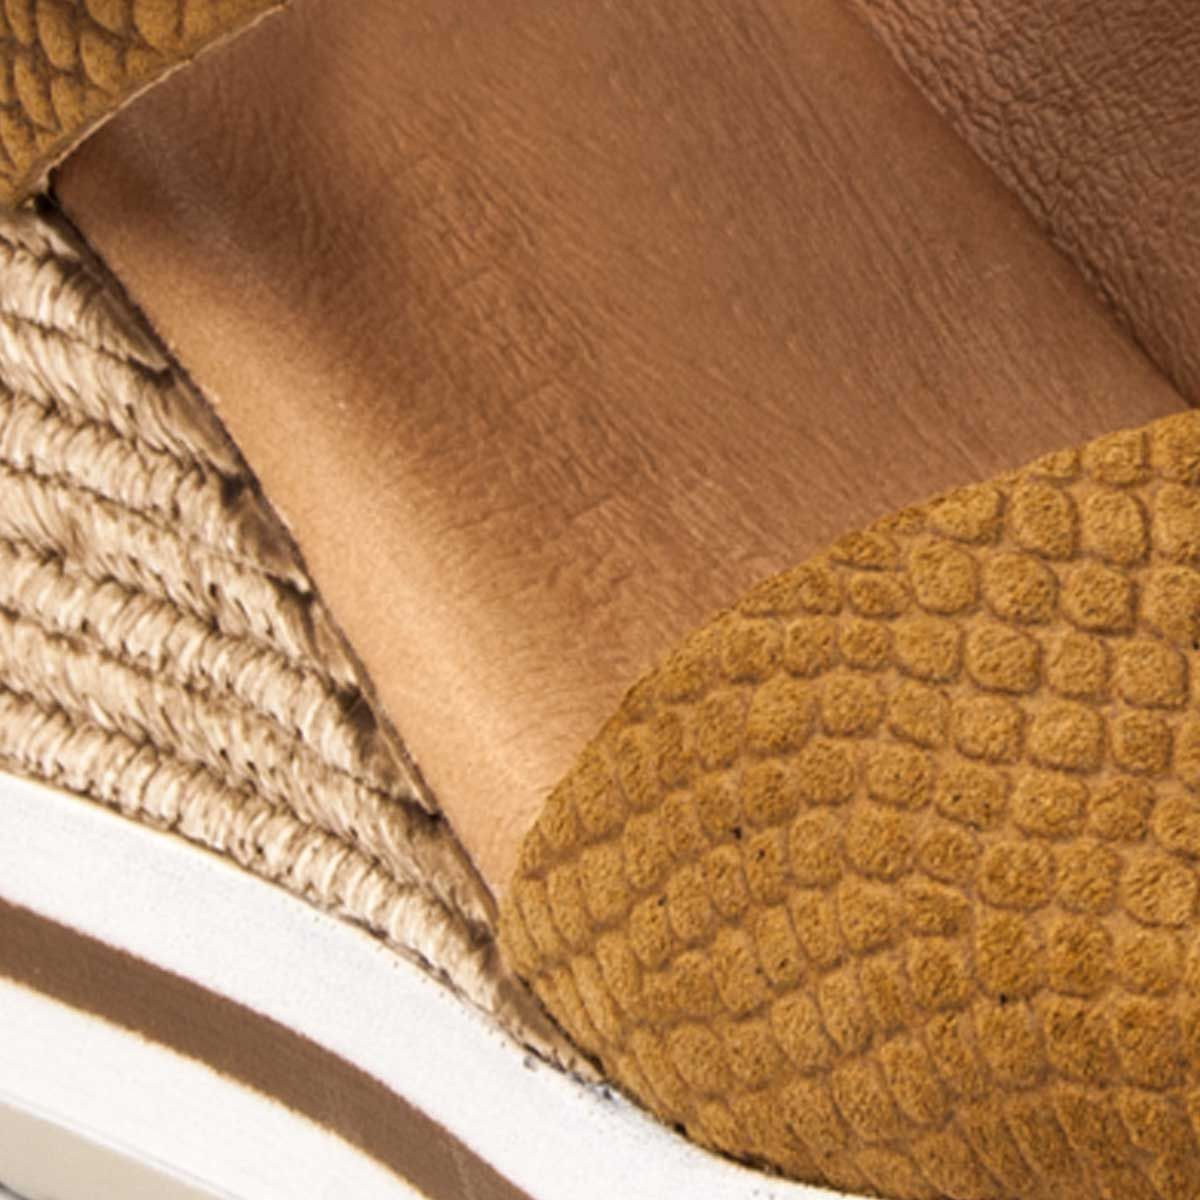 Purapiel Wedge Sandal in Camel